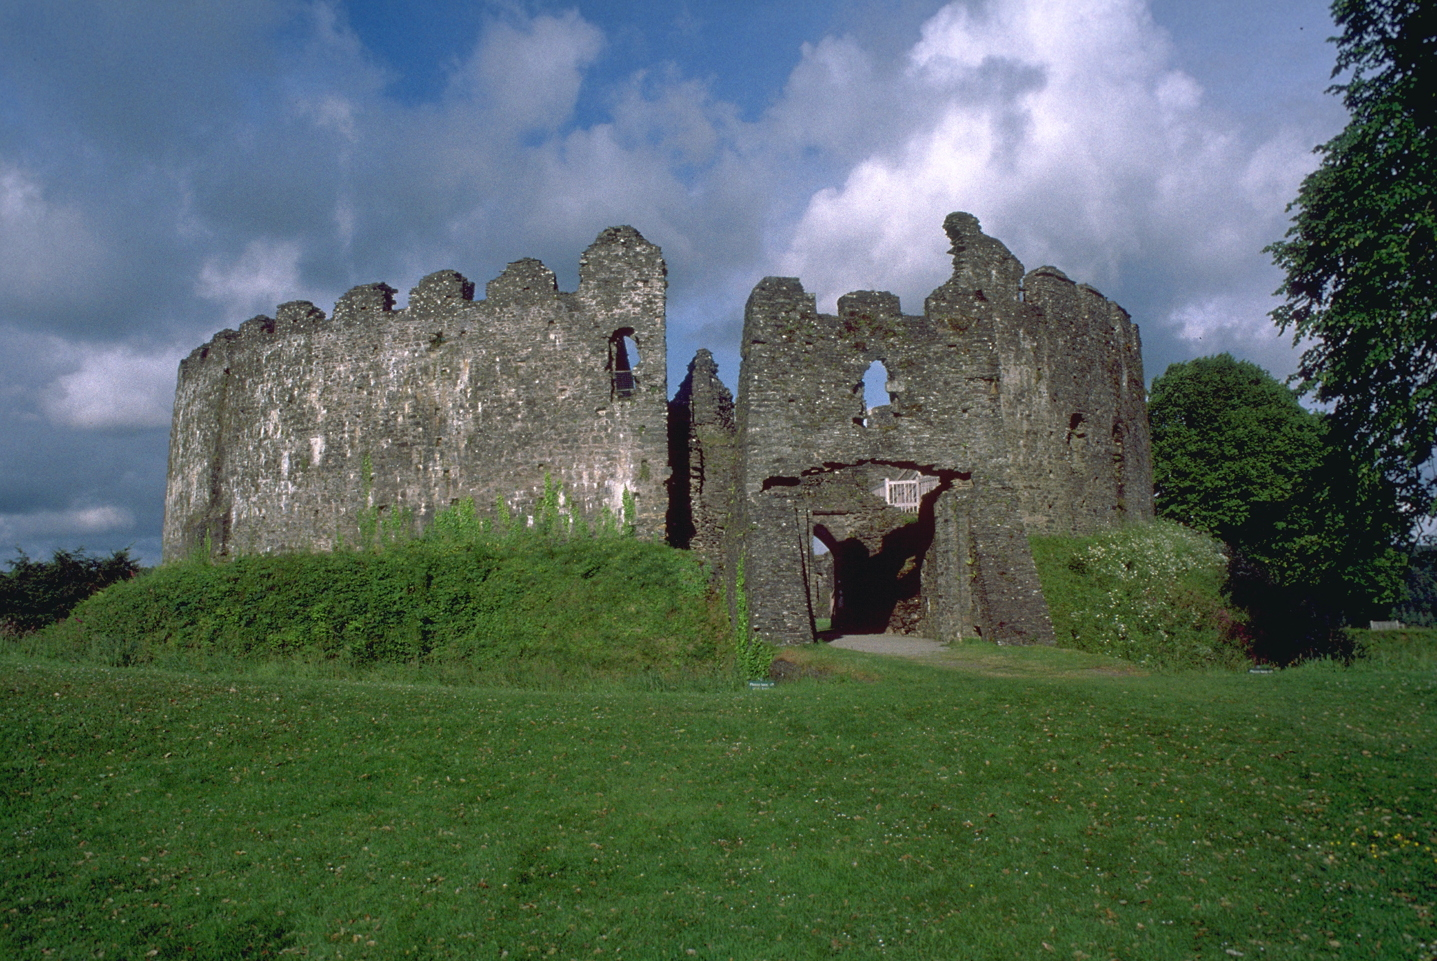 Restormal Castle